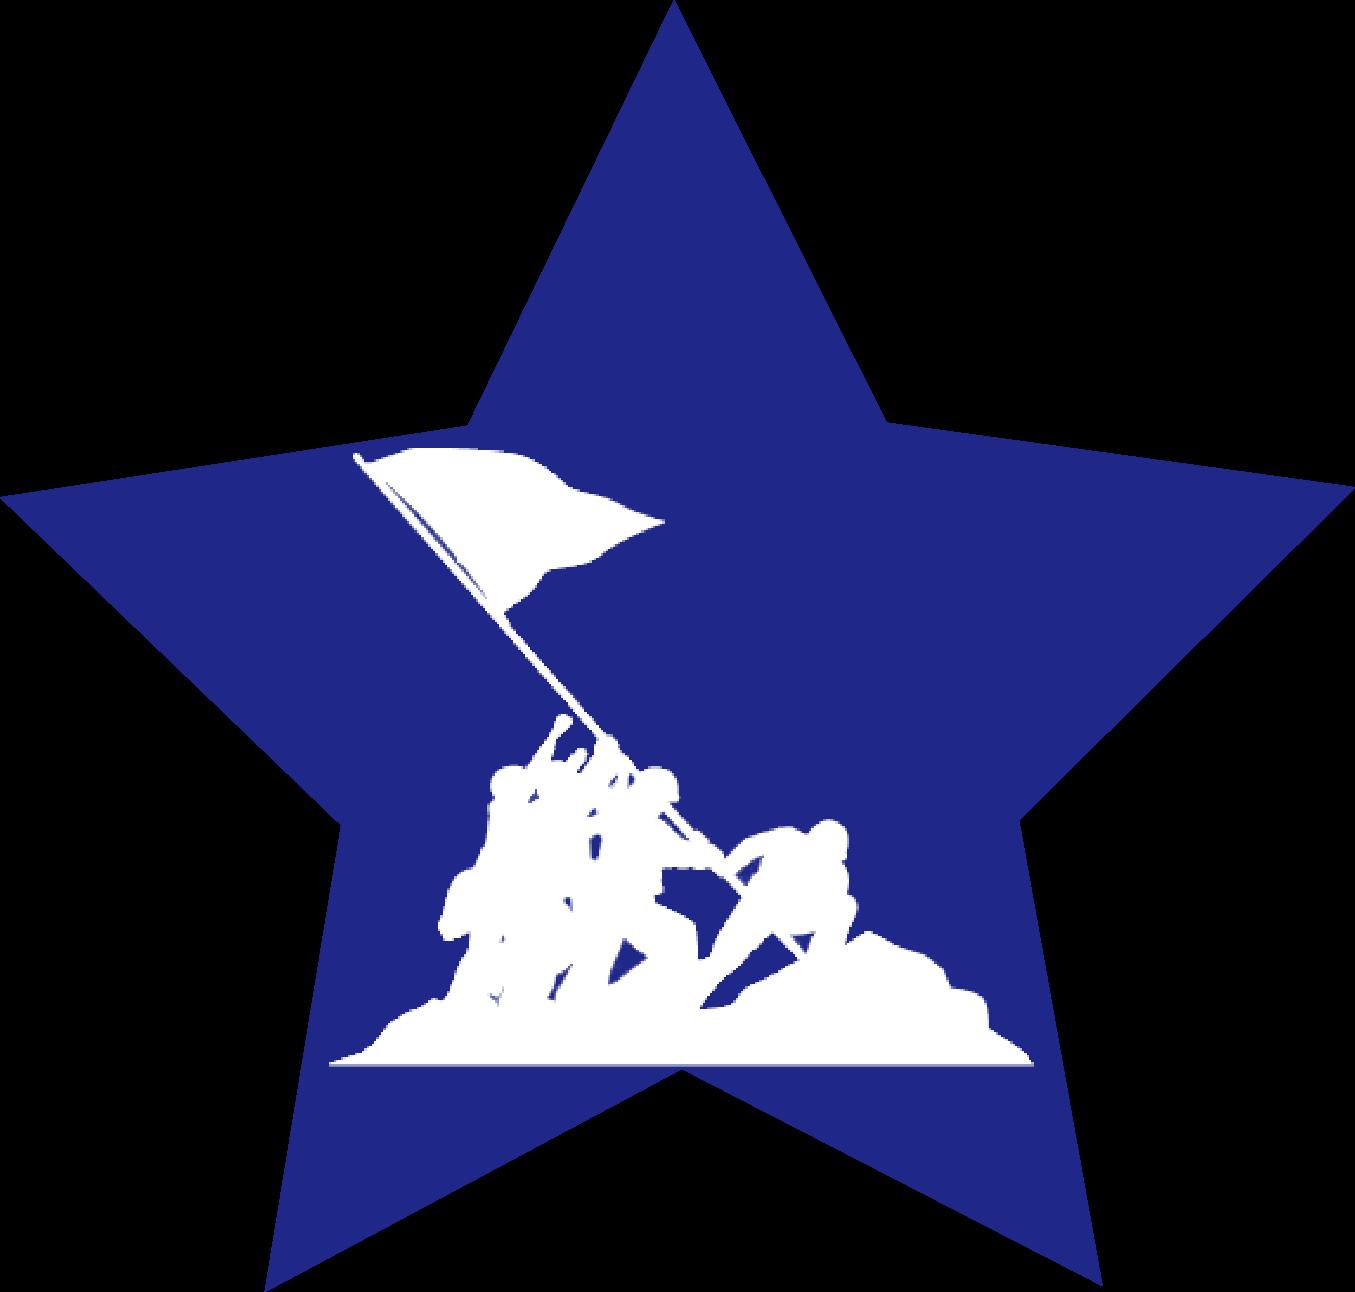 Blue Star Salute 2016